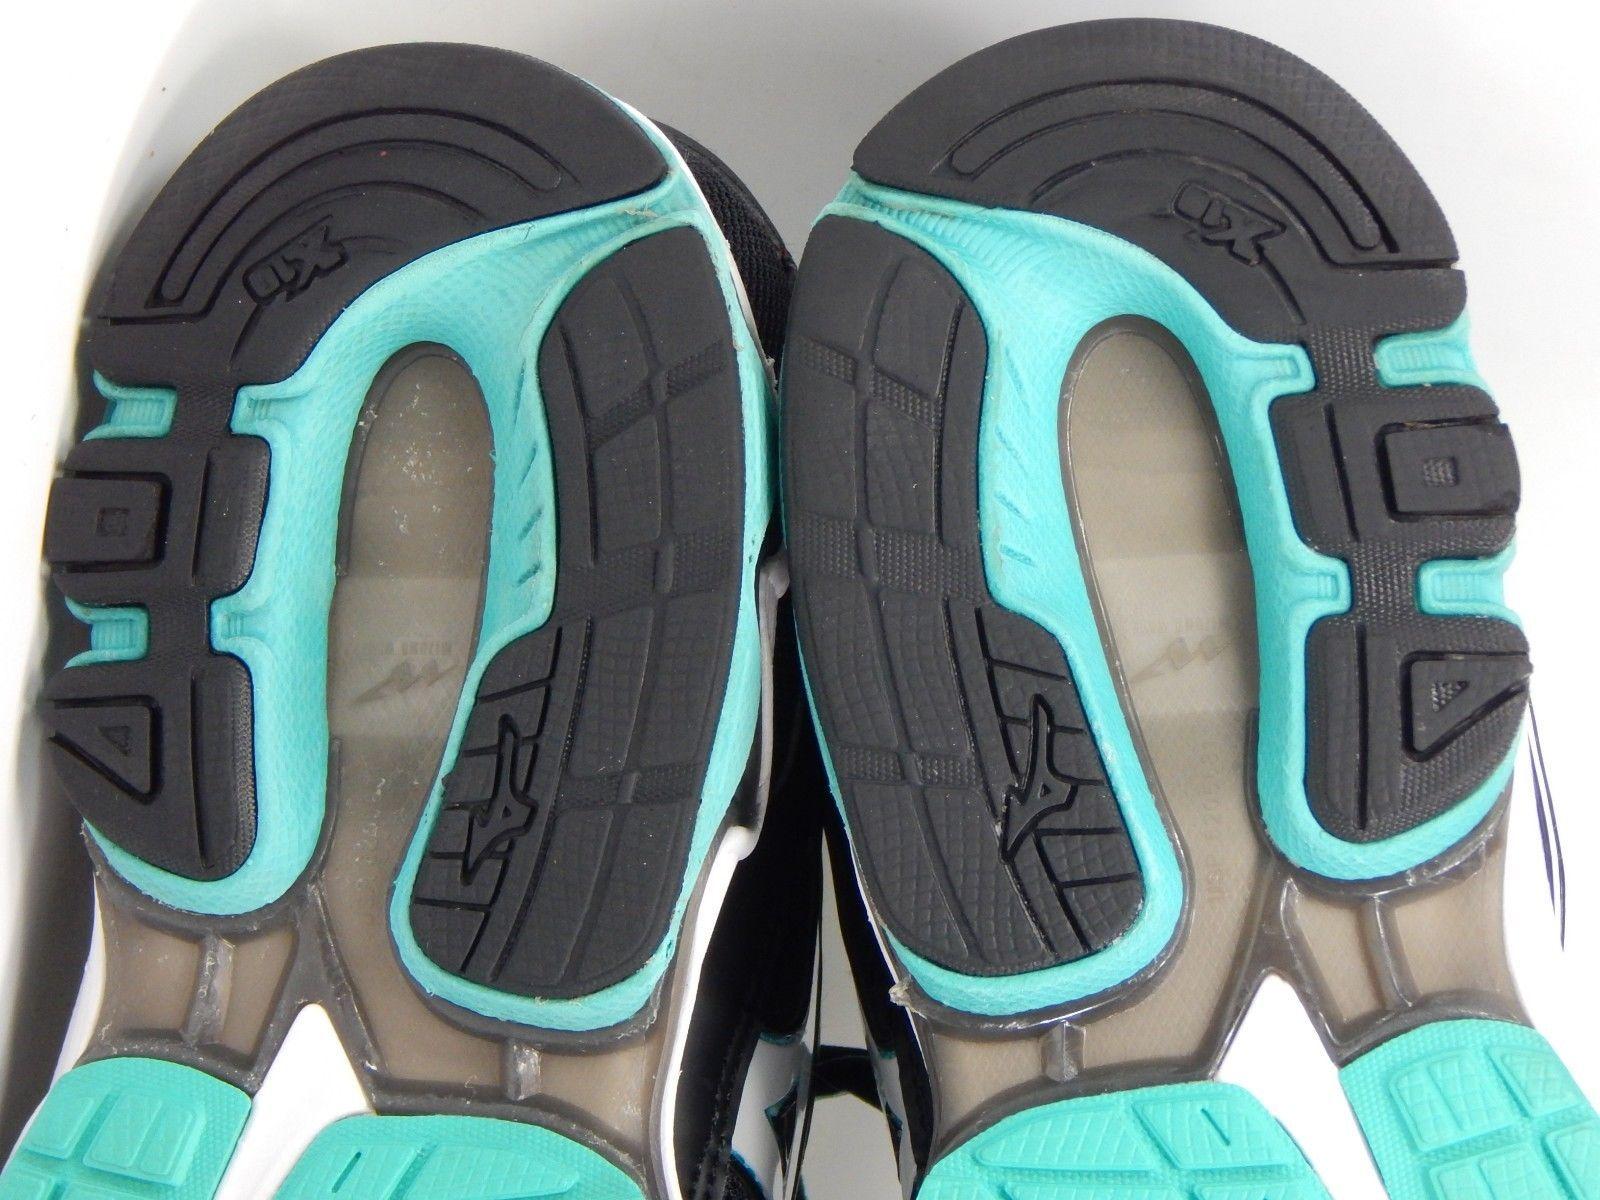 Mizuno Minimal Shoes Green And Black